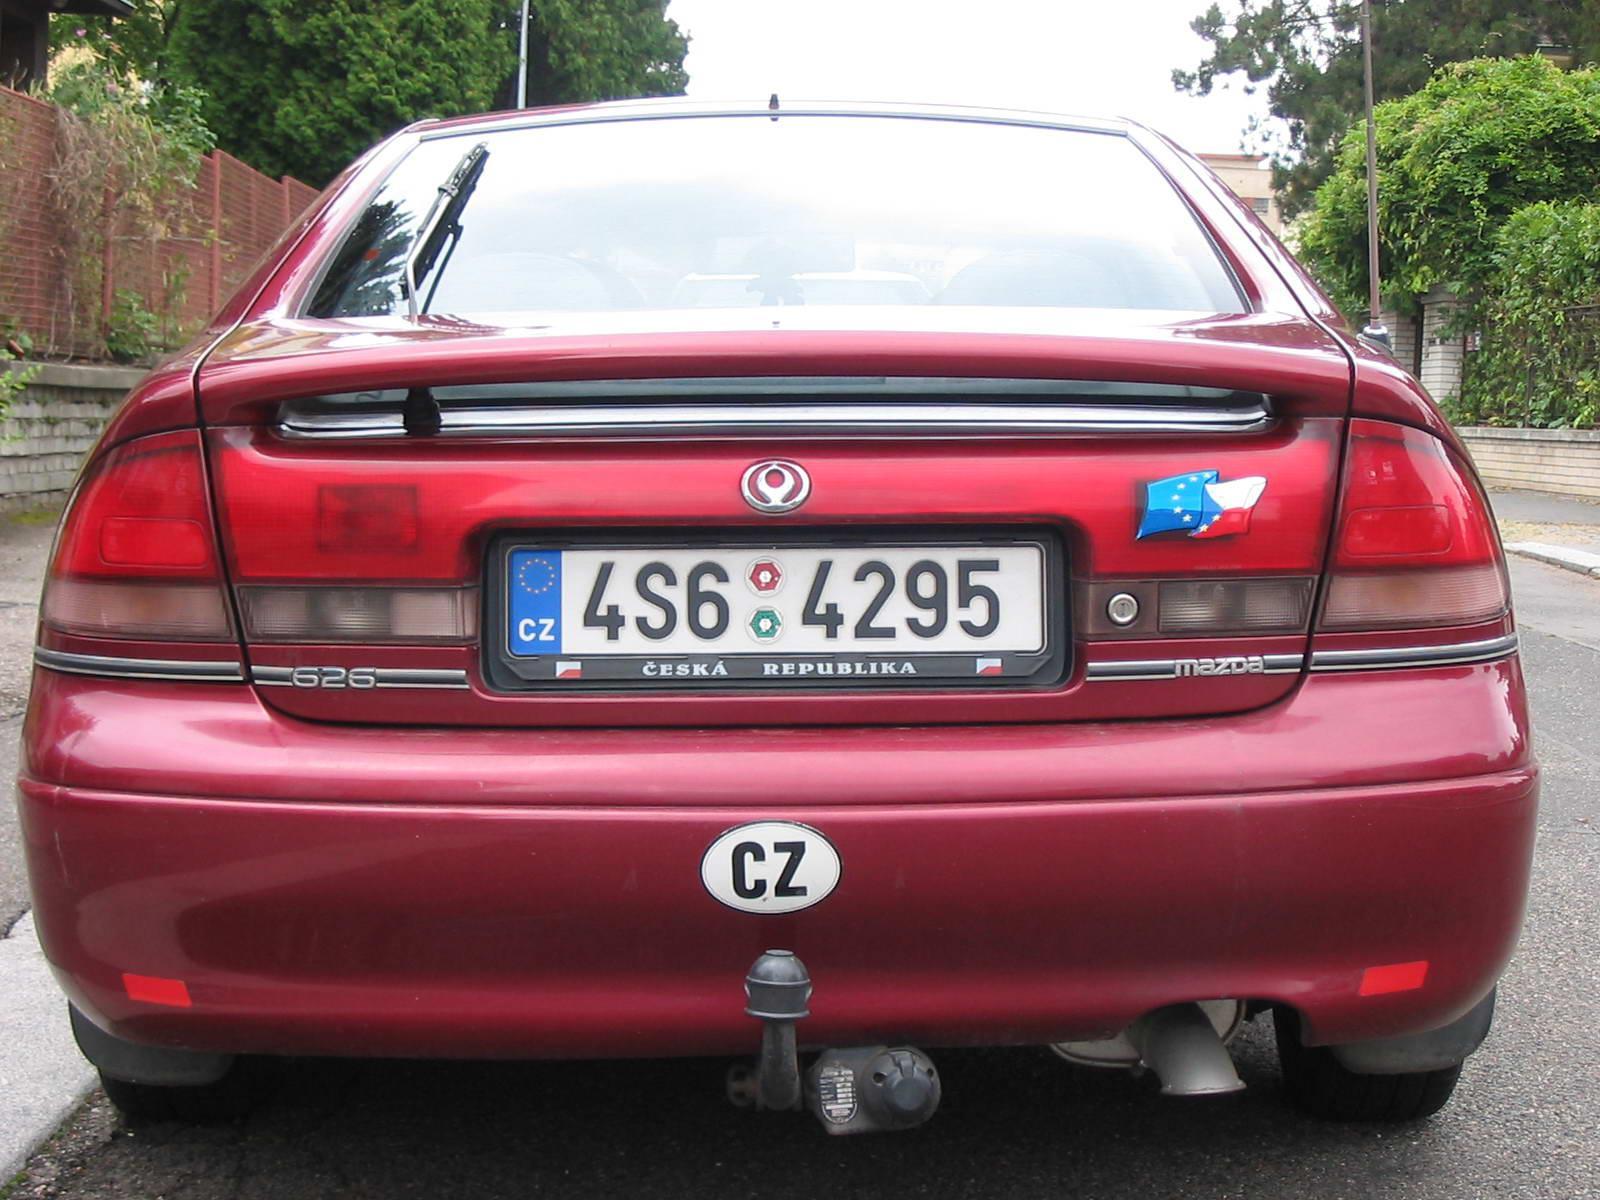 1993 mazda 626 ge  generation 4 diesel 55 kw 2001 Mazda 626 Battery Size 2001 Mazda 626 Automatic